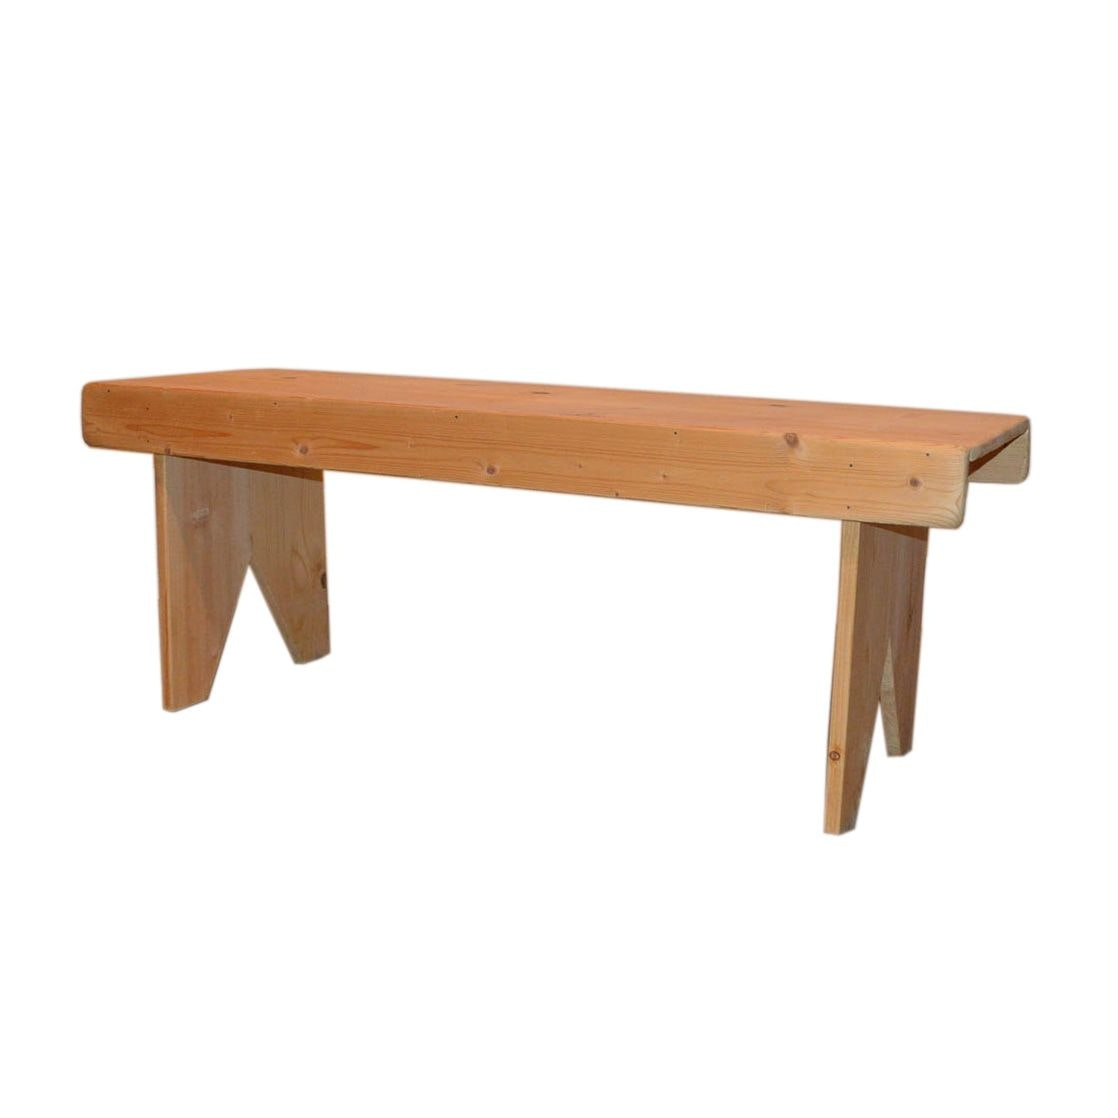 Rustic Pine Bench